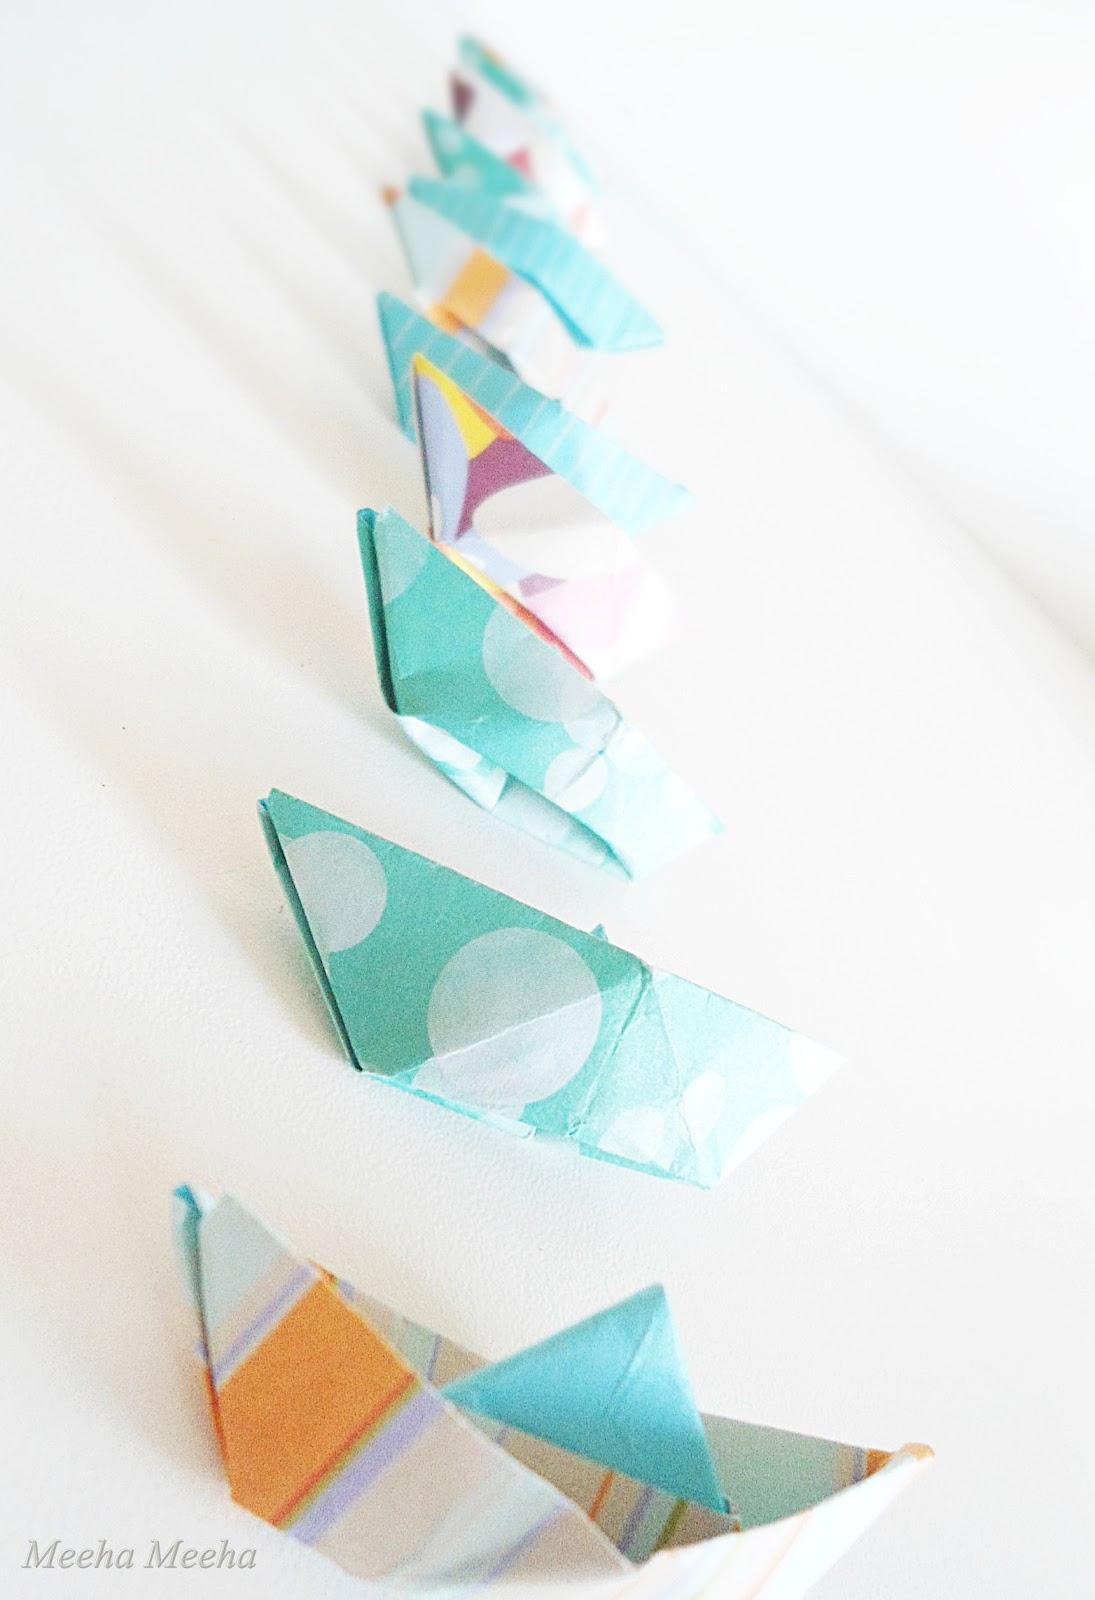 meeha meeha origami boat garland